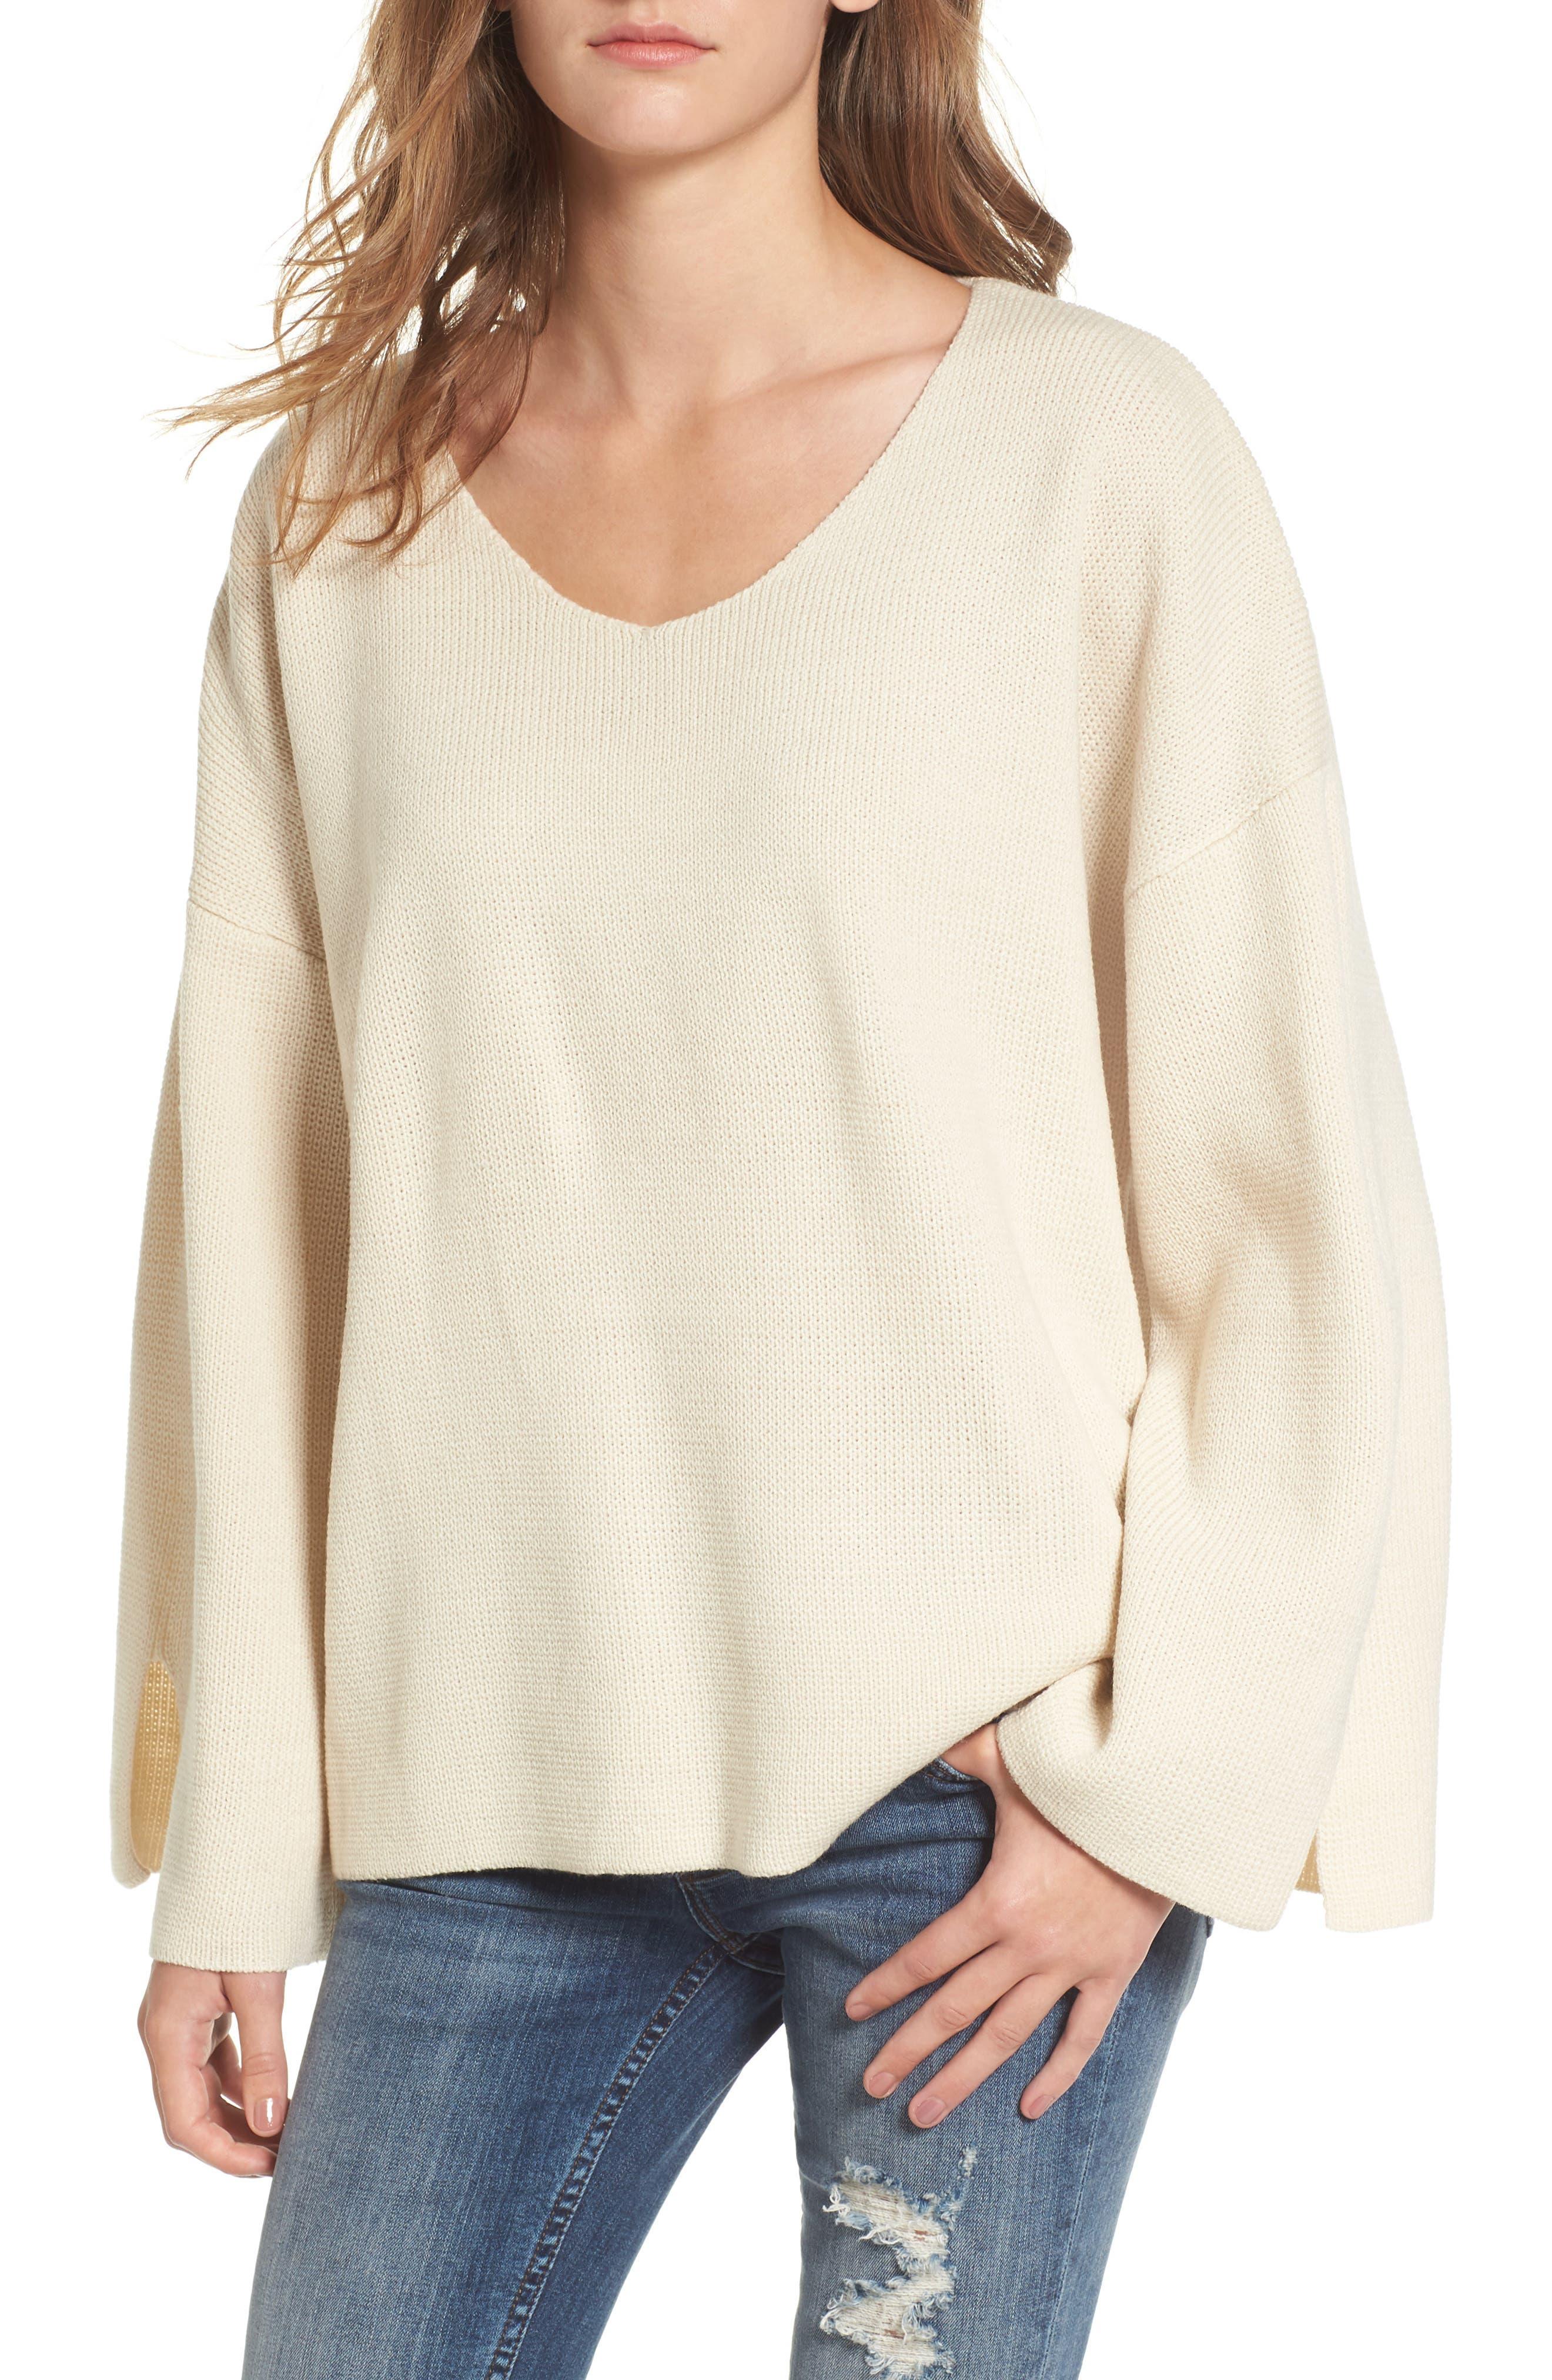 Main Image - Moon River V-Neck Sweater